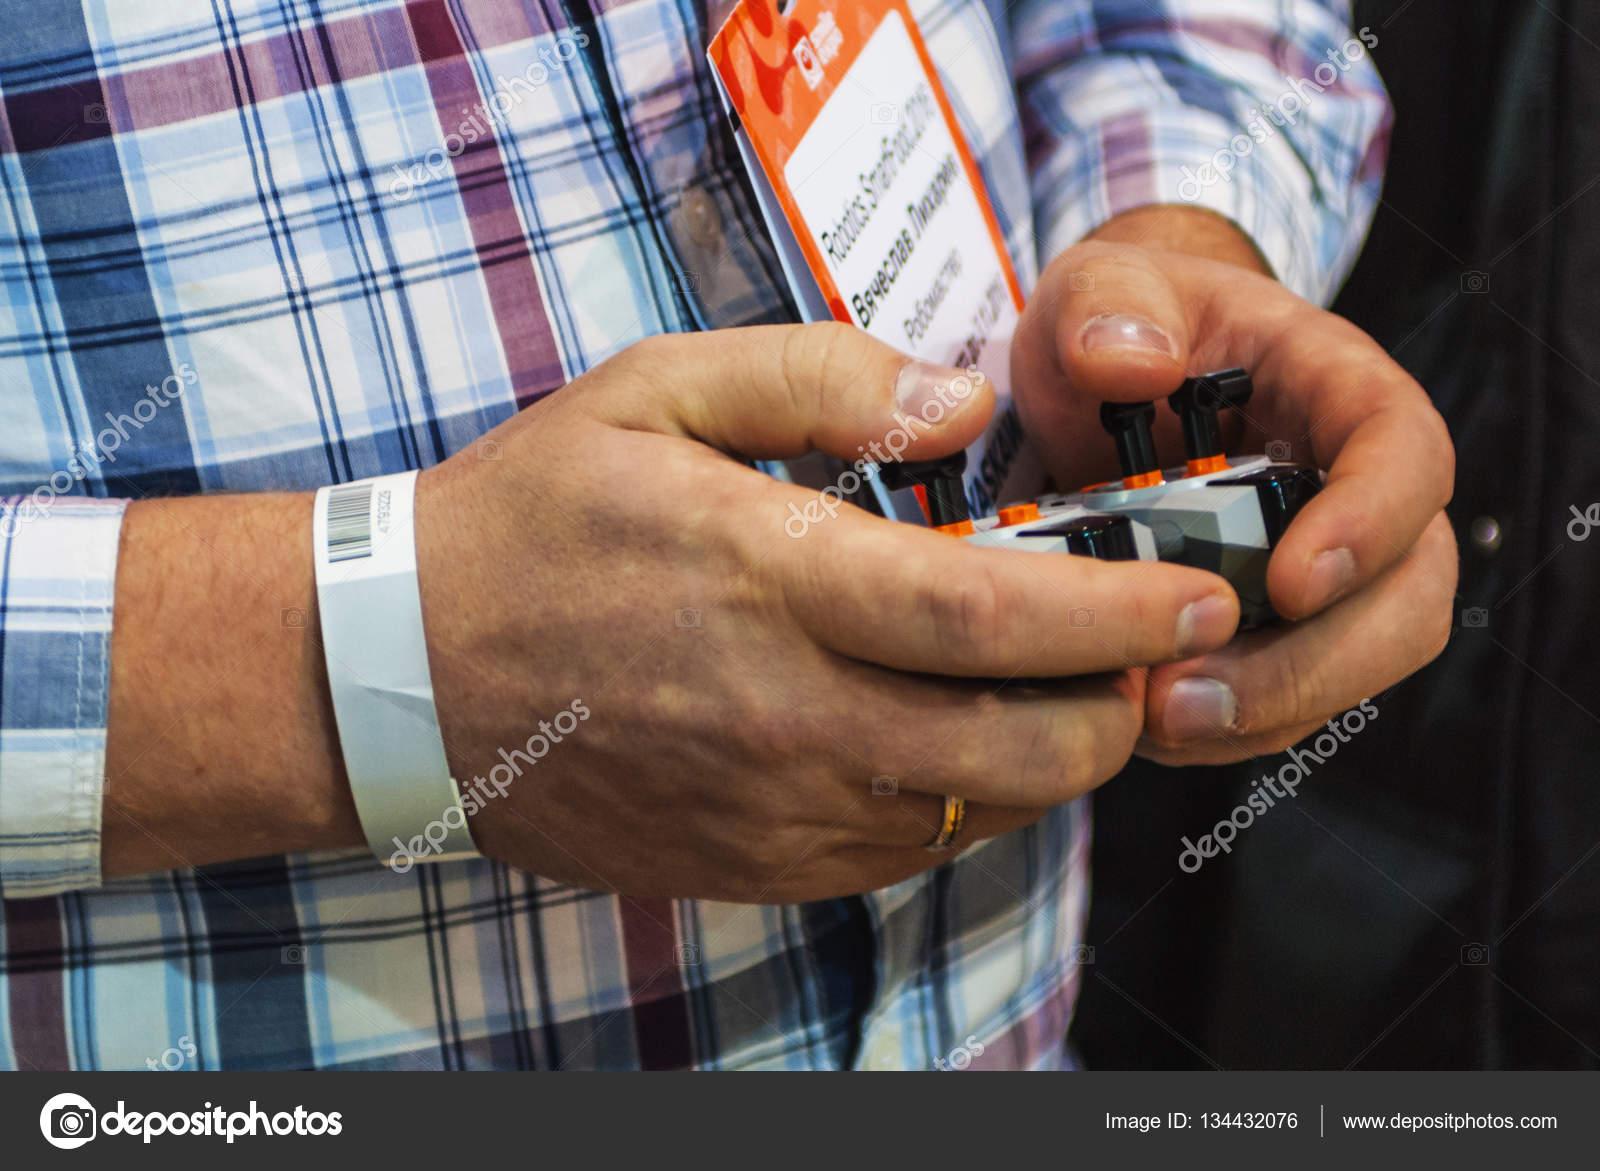 Man is holding joystick on Robotics Expo 2016 – Stock Editorial